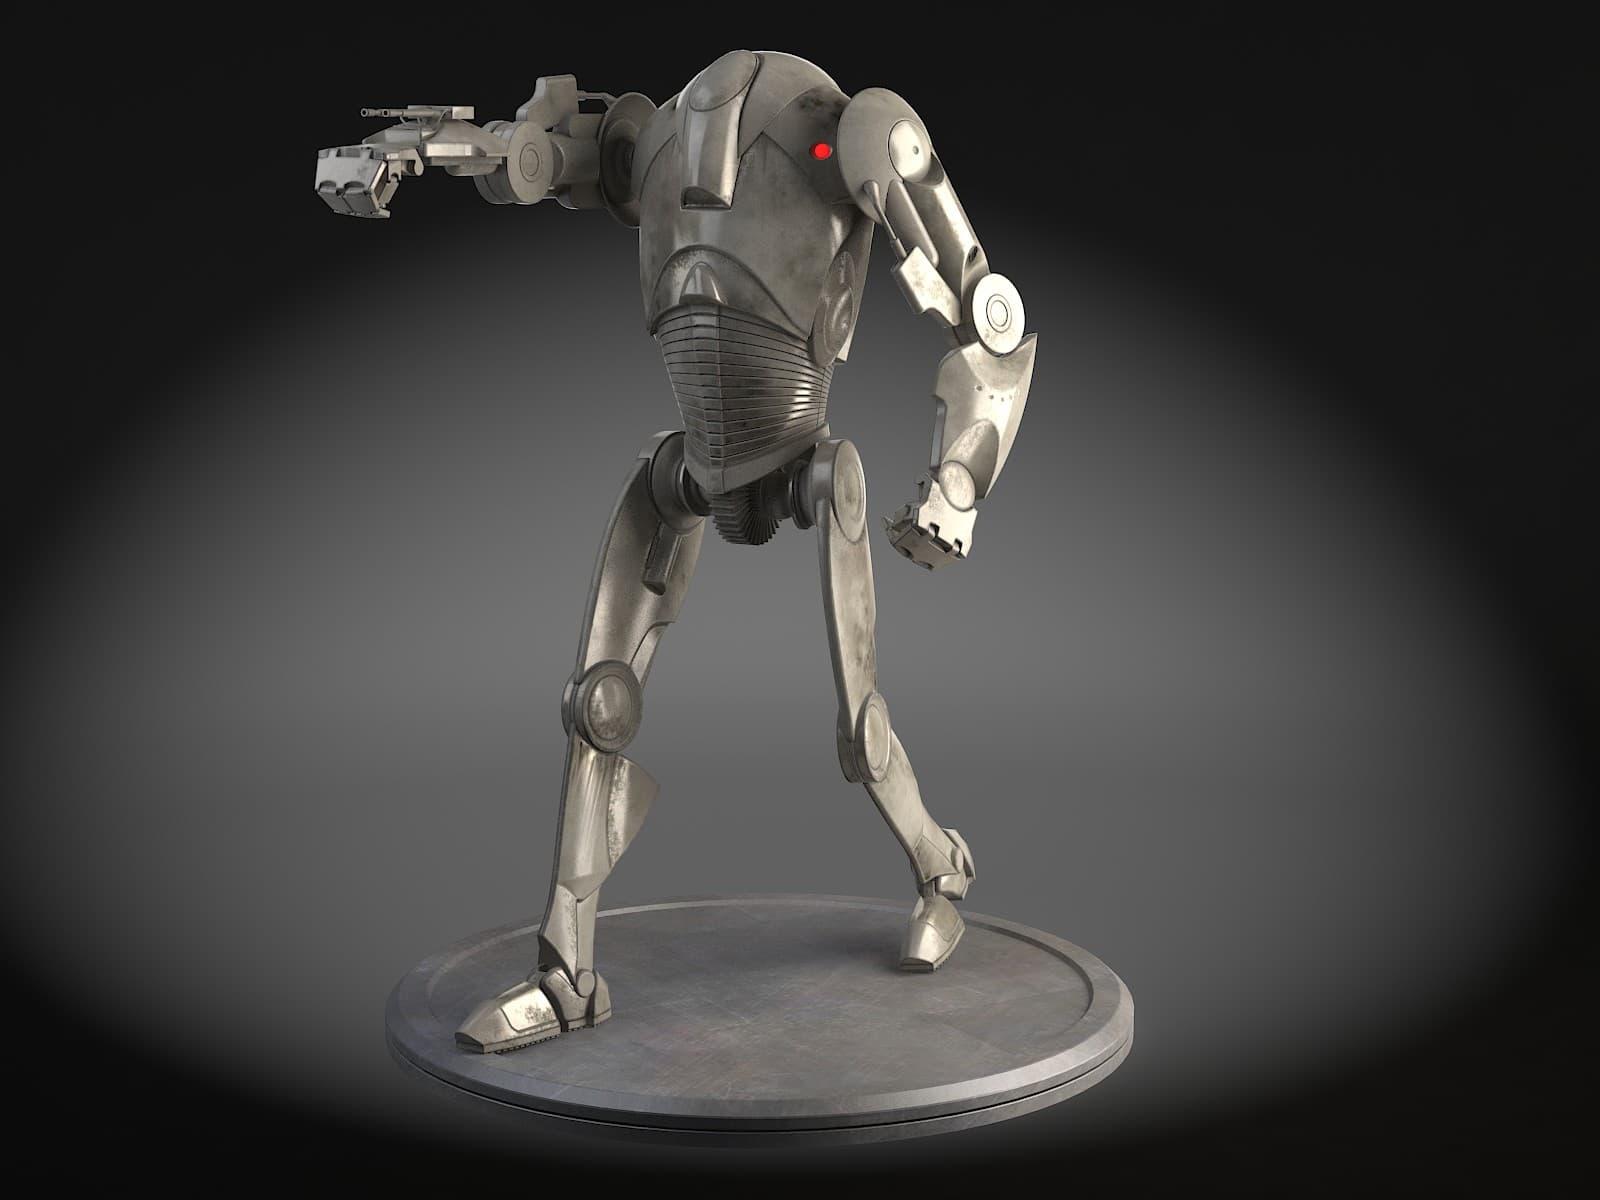 Star Wars B2 Battle Droid 3D Model